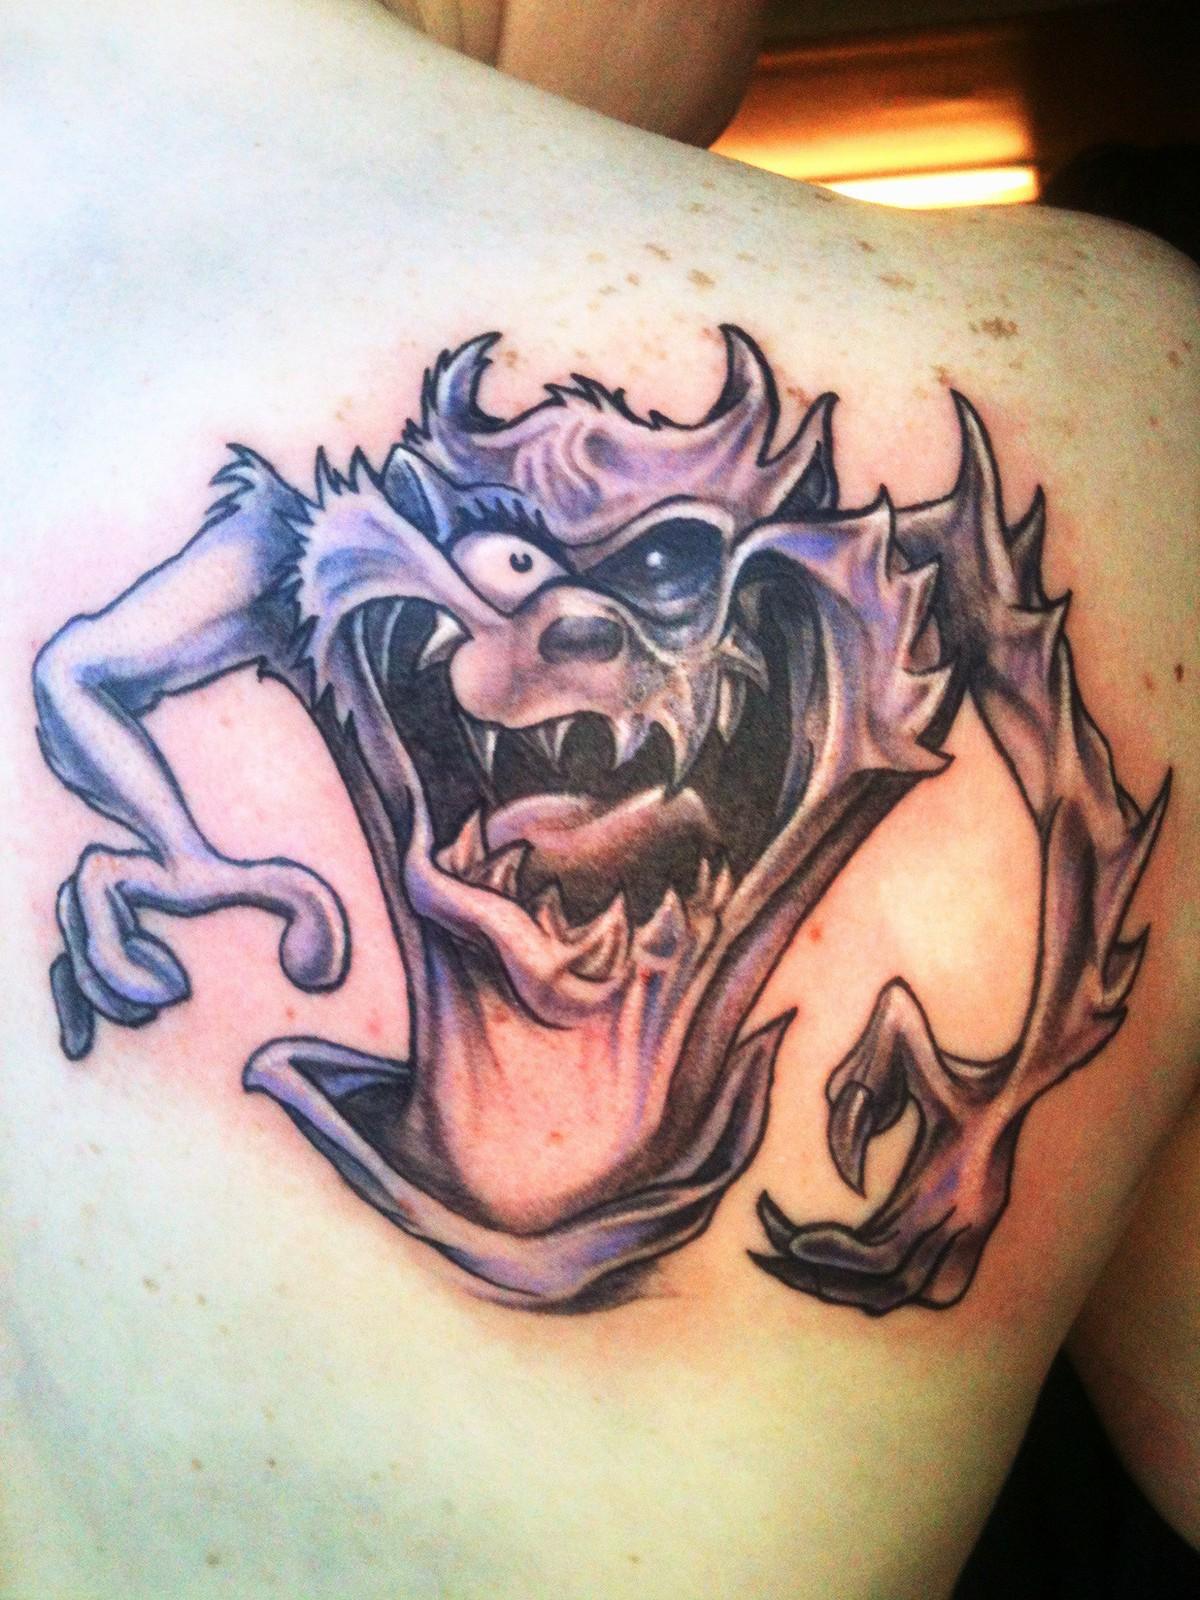 Baby Tazmania Tattoos tatto tazmania taz tattoo